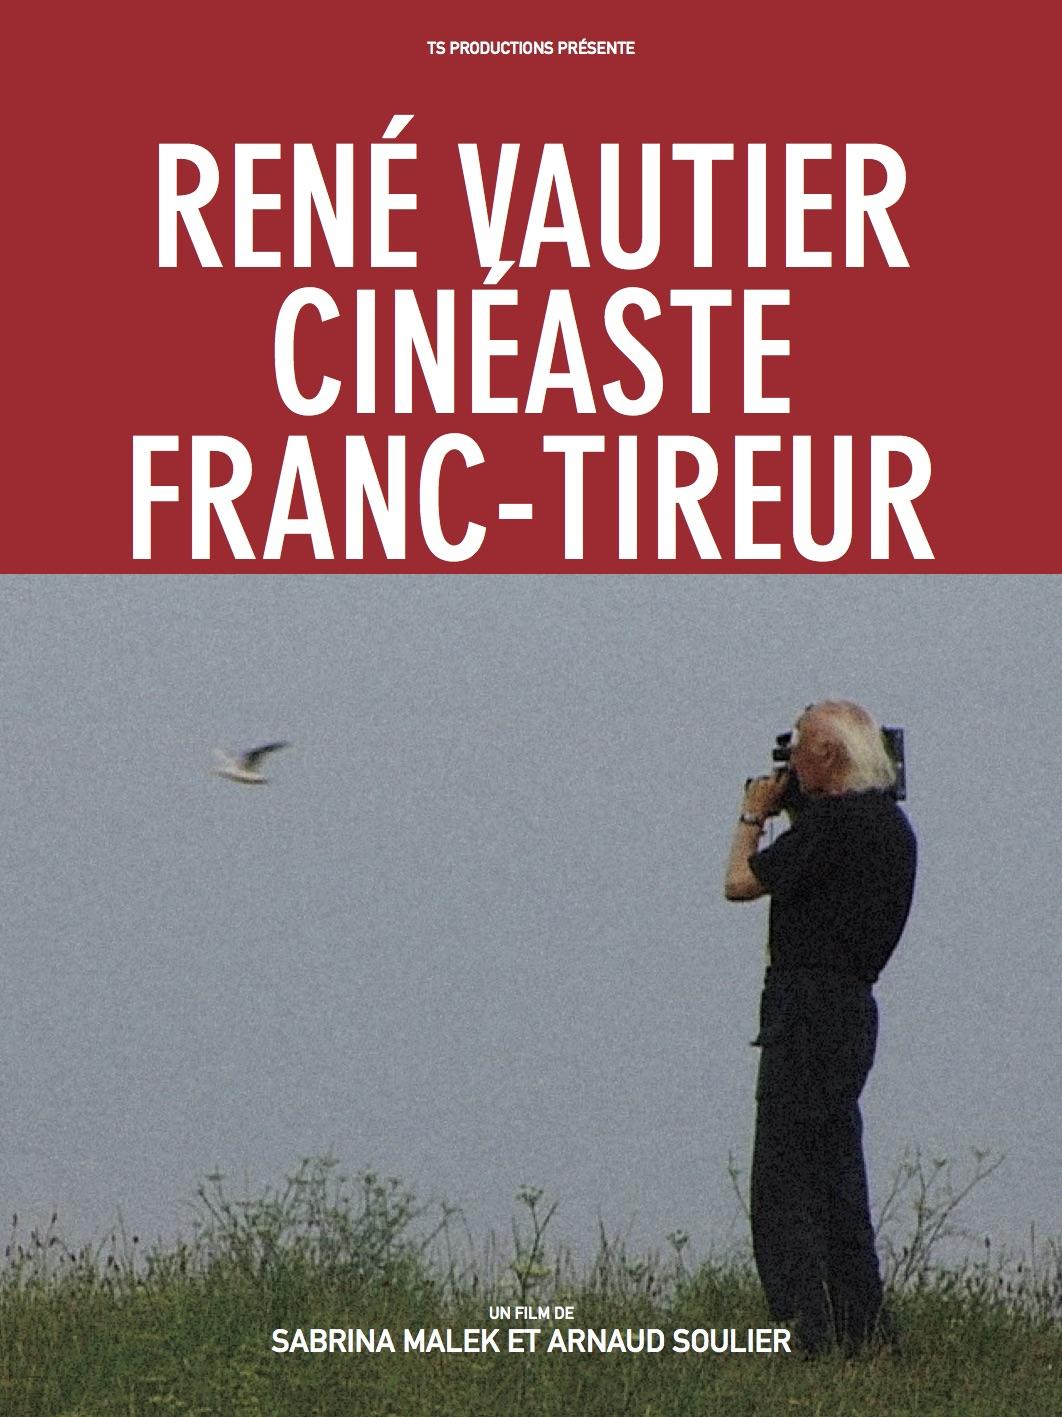 RENÉ VAUTIER, CINÉASTE FRANC-TIREUR - Sabrina Malek & Arnaud Soulier